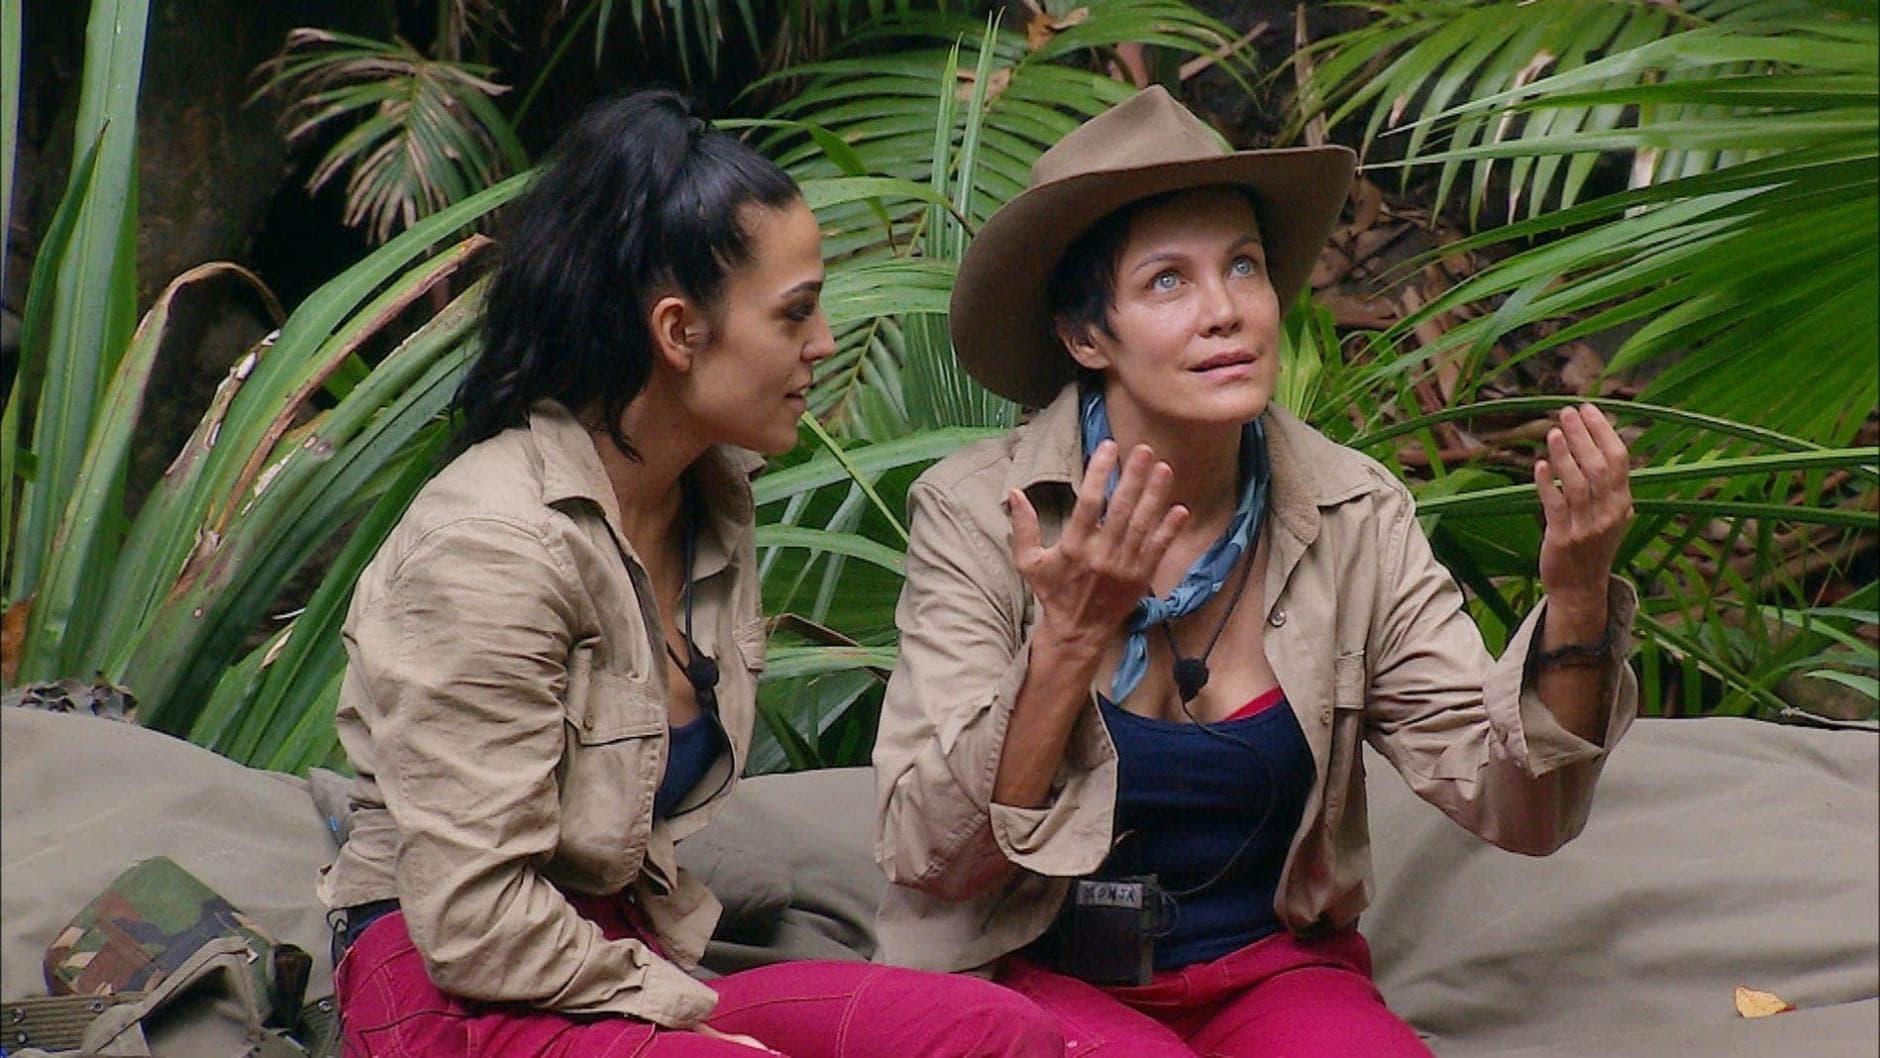 Dschungelcamp 2020 Tag 7